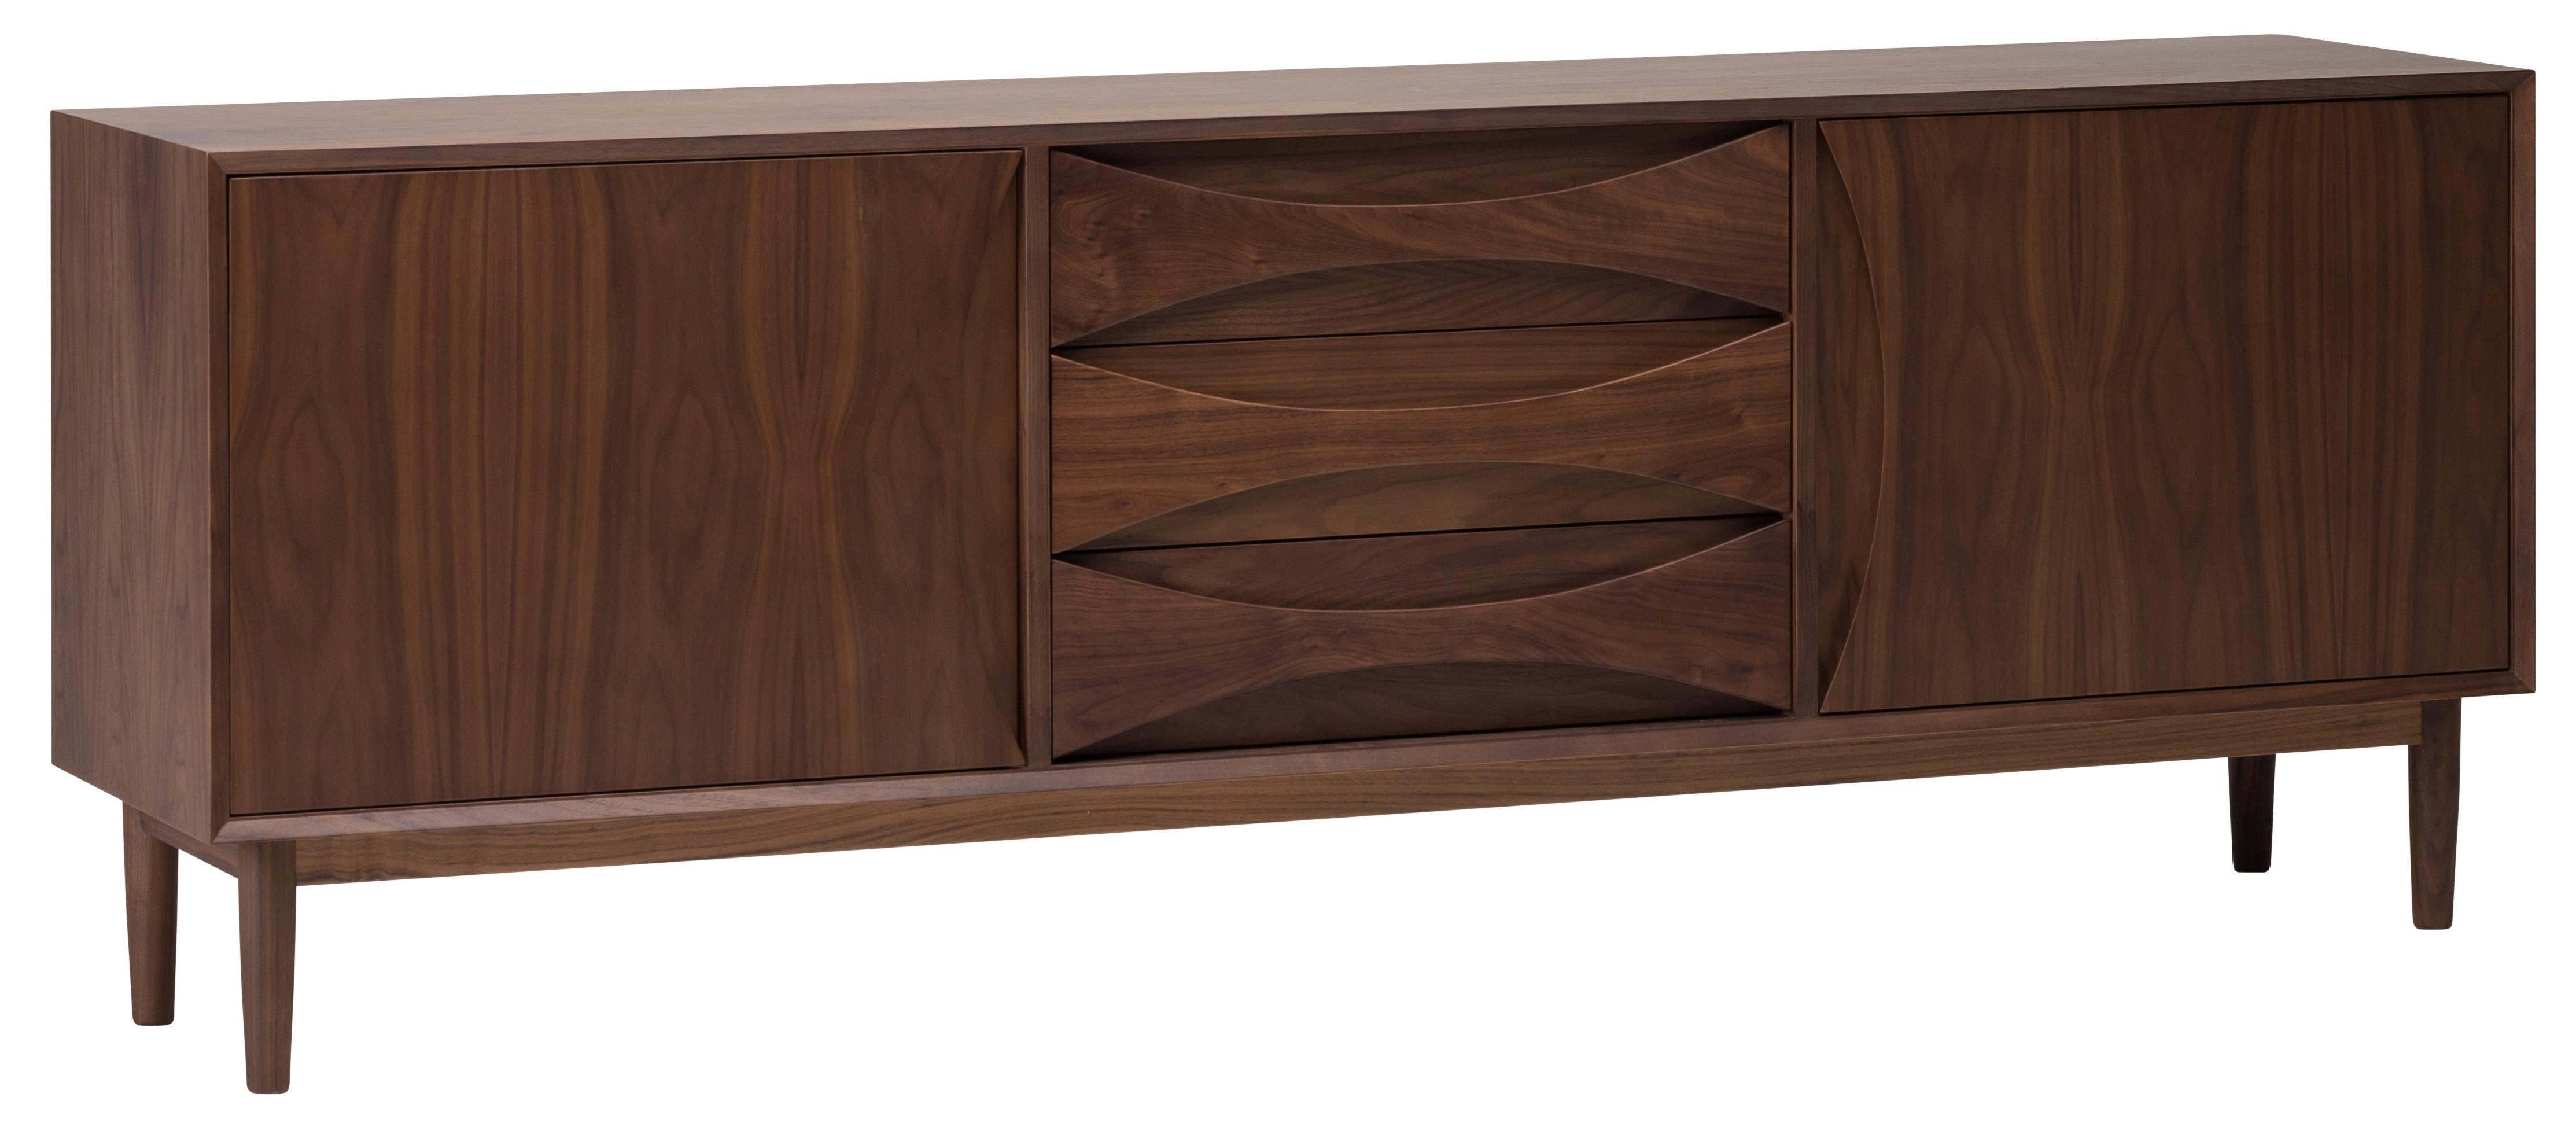 Modern & Contemporary Lowrey 4 Door Credenza (View 16 of 20)